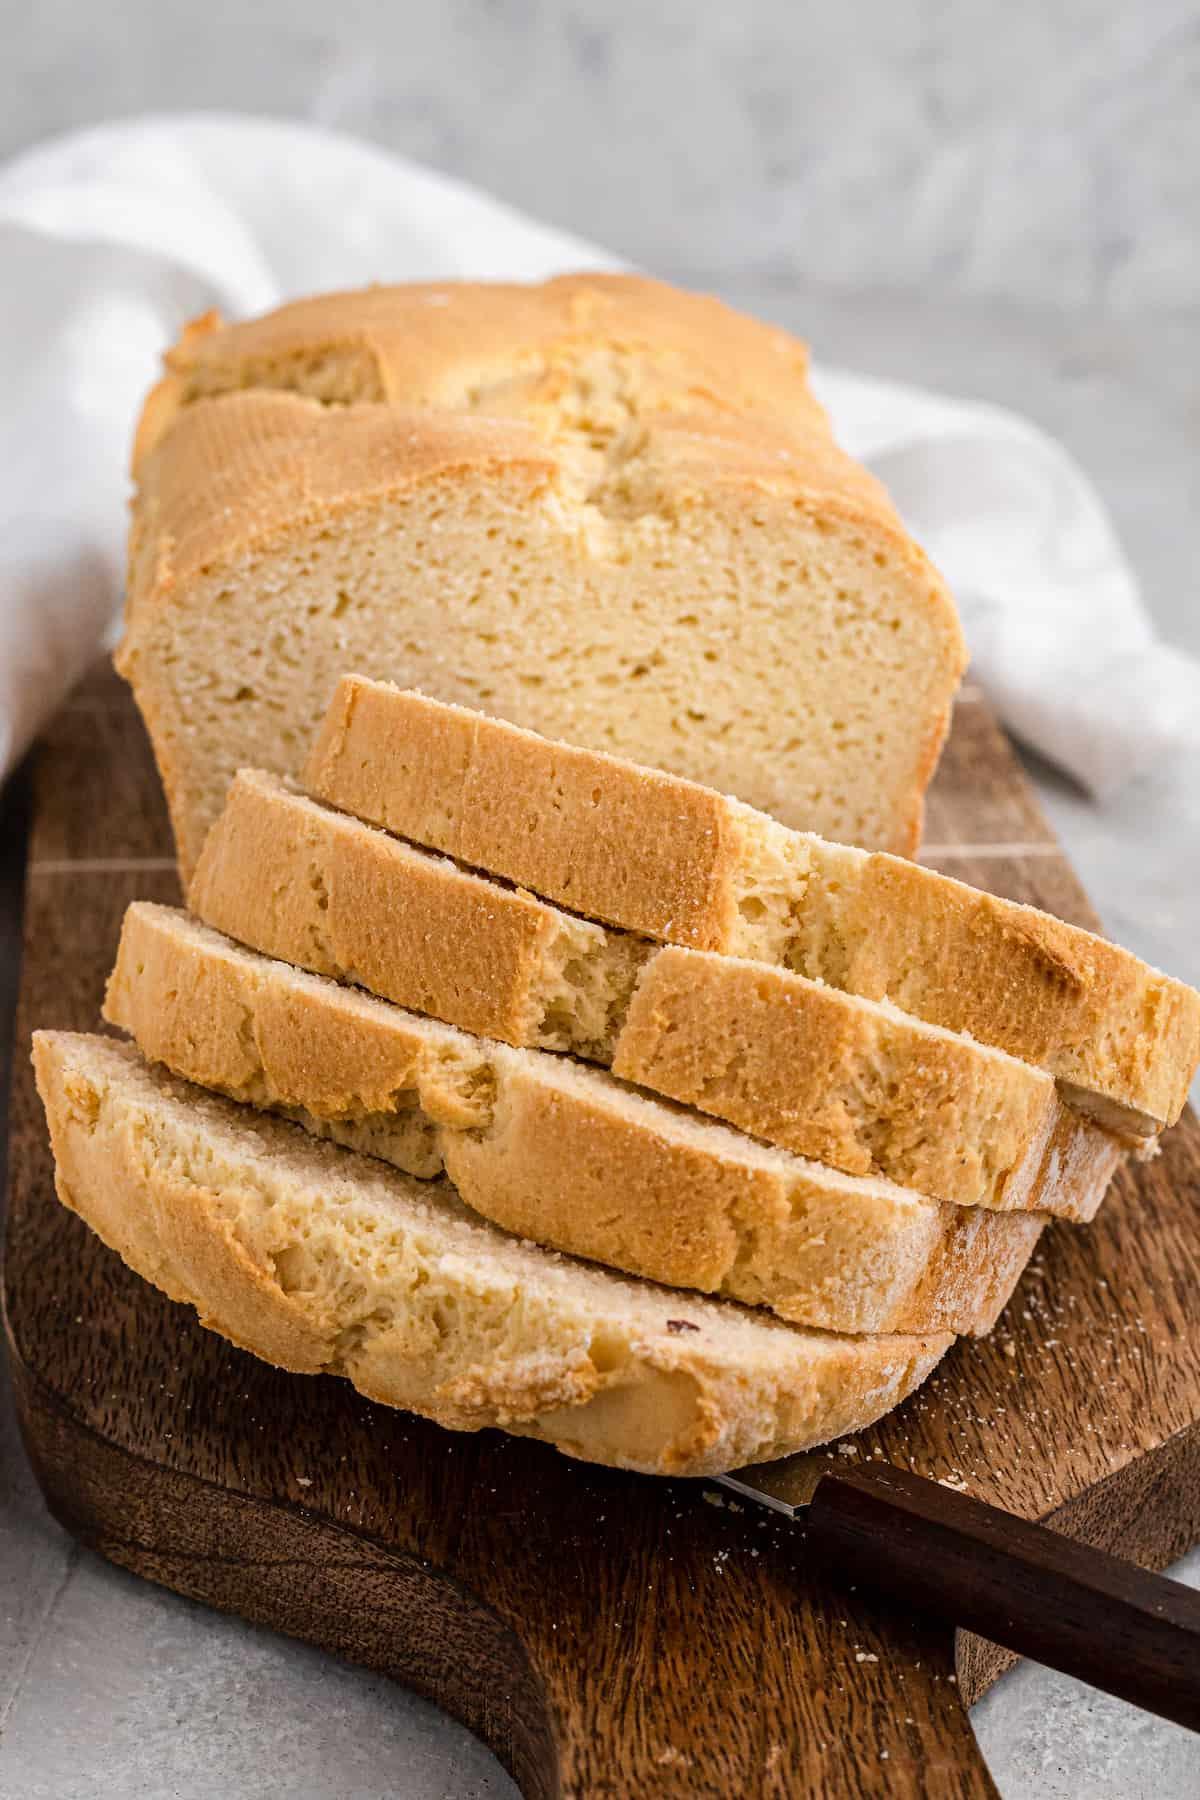 slices of stacked gluten free sandwich bread on a wooden board